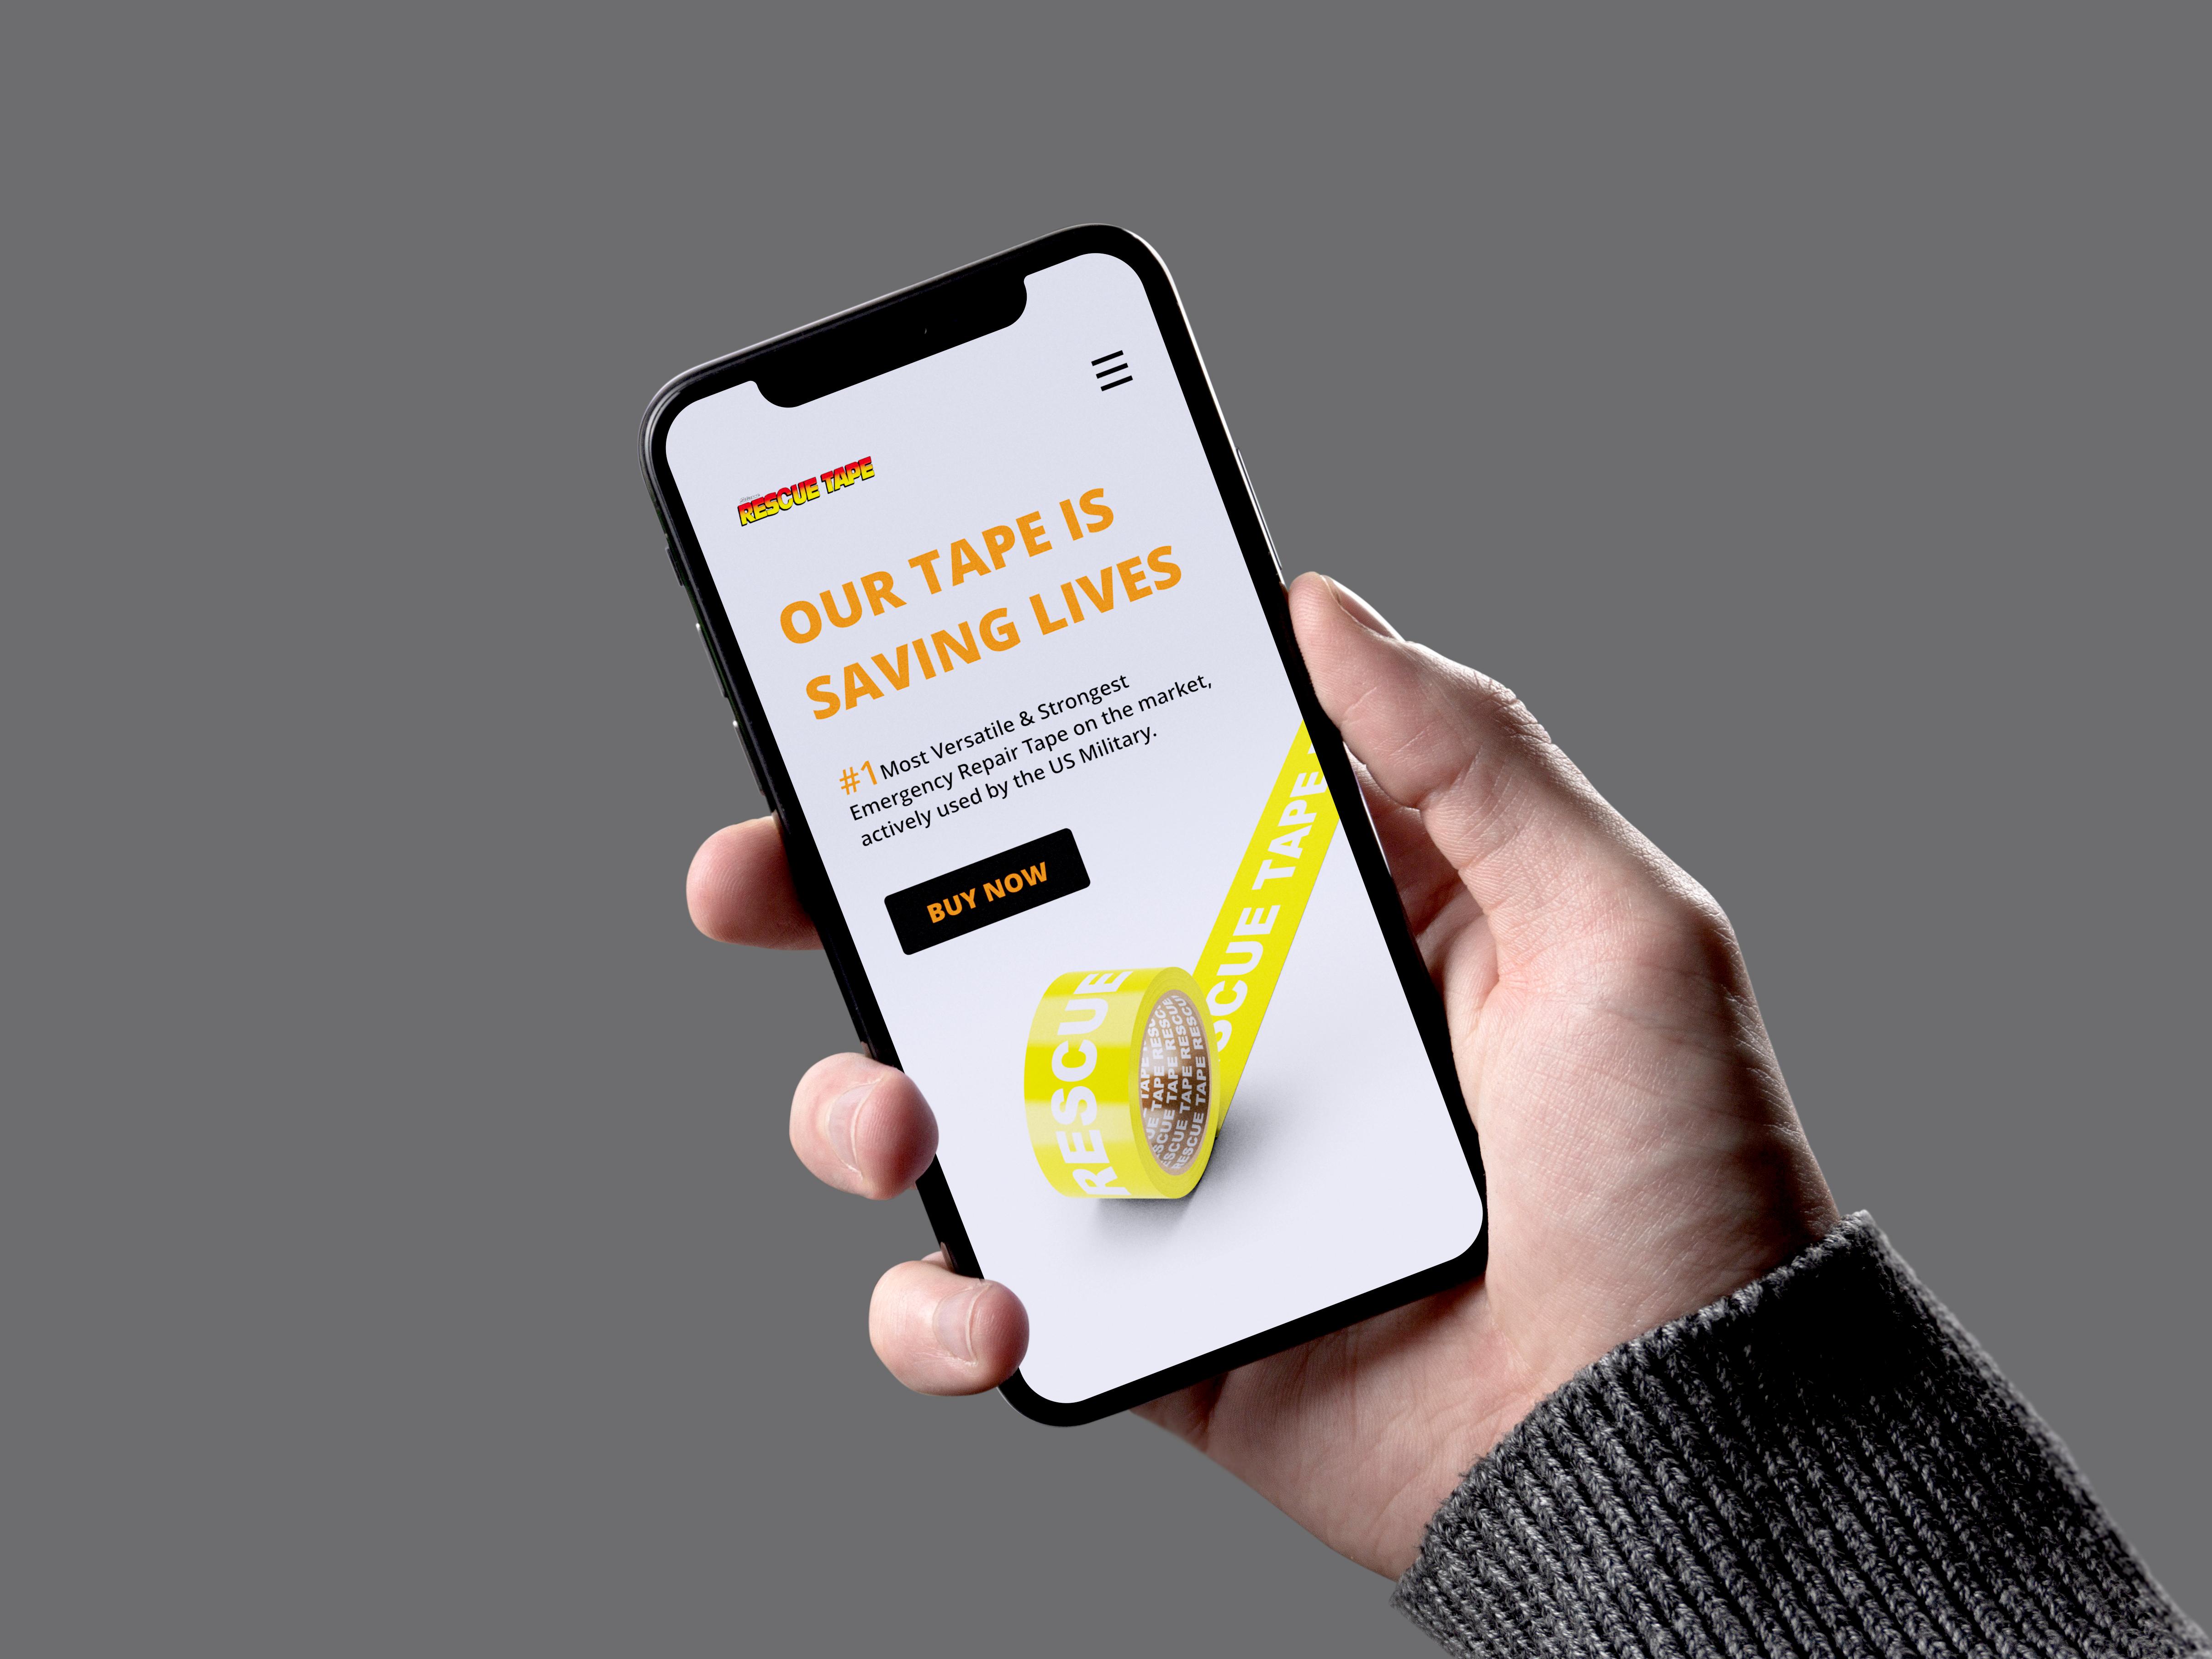 Smartphone dizajn za Rescuetape